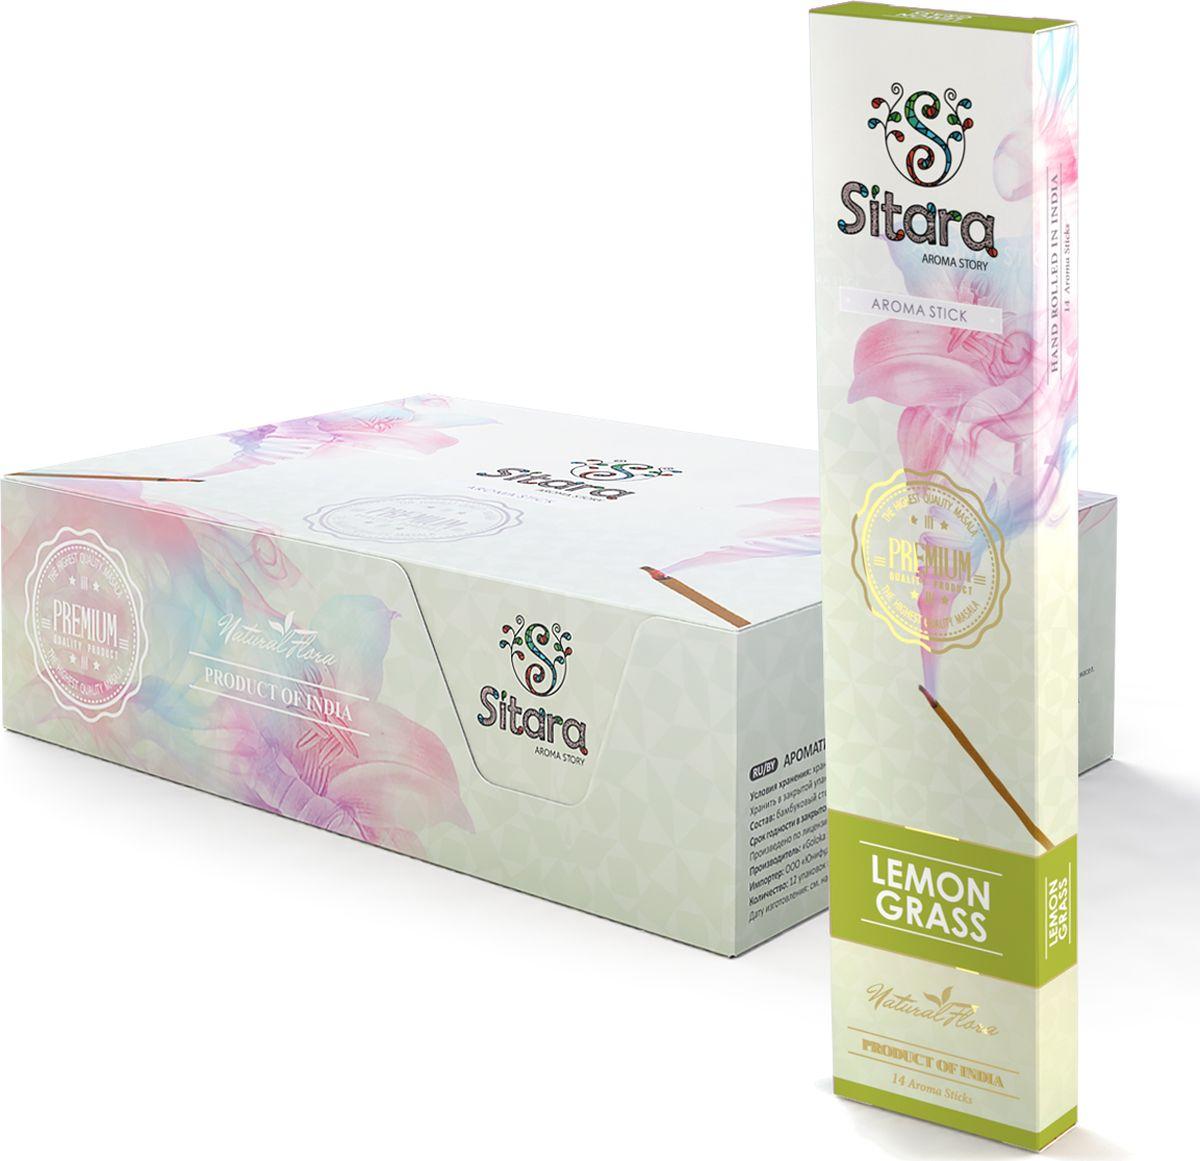 Ароматические палочки Sitara Premium